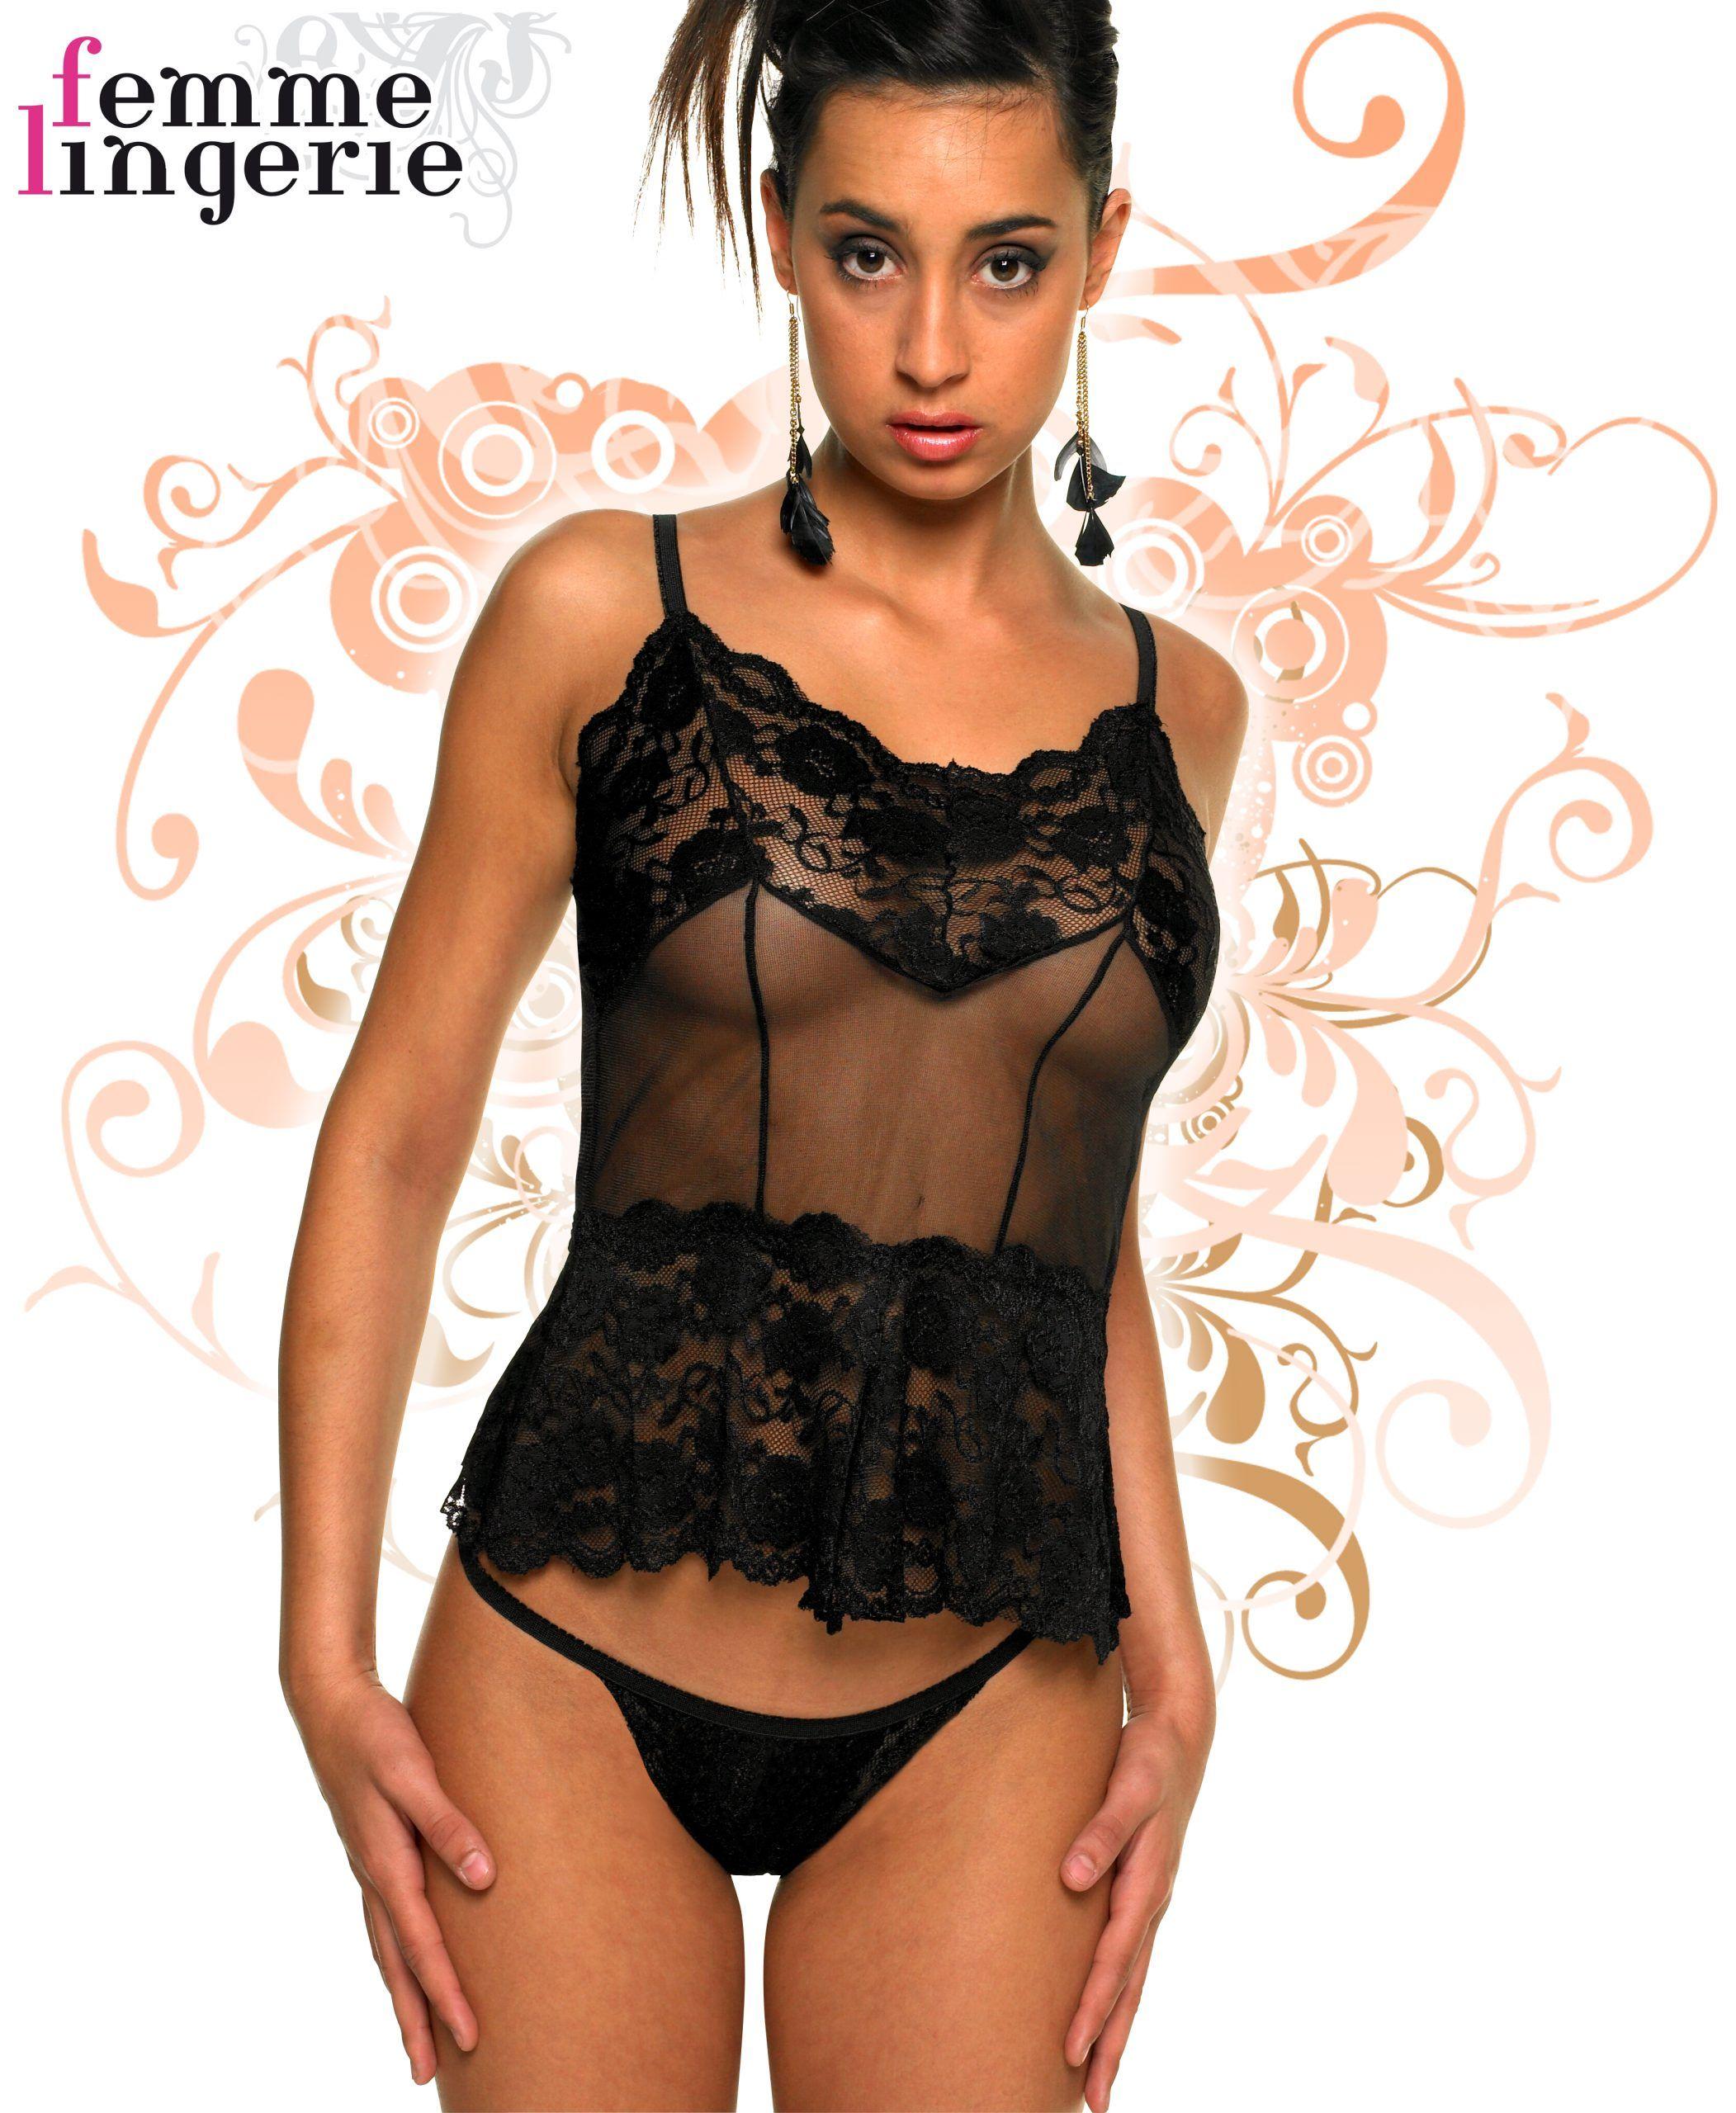 Femme Lingerie | Fotografía | Diseño web